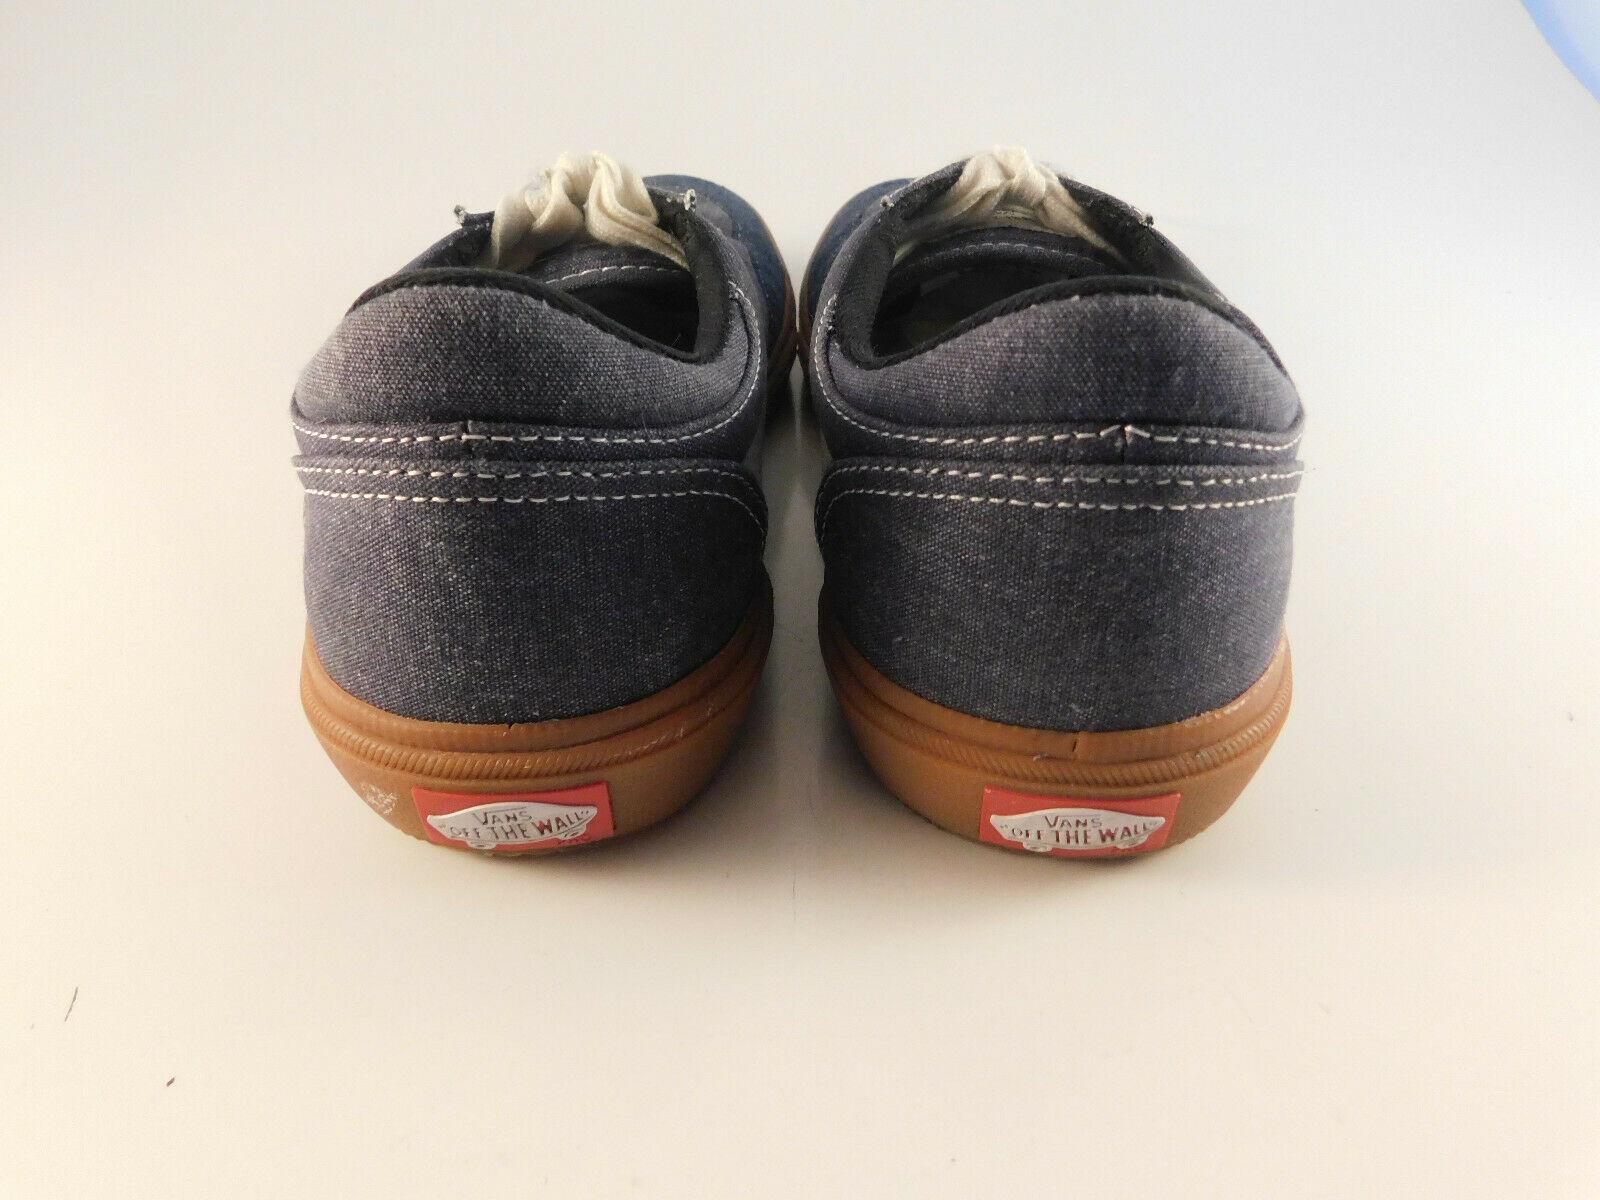 Vans Gilbert Crockett PRO Denim Suede Size 8.5 Men's Skateboard Shoe image 3